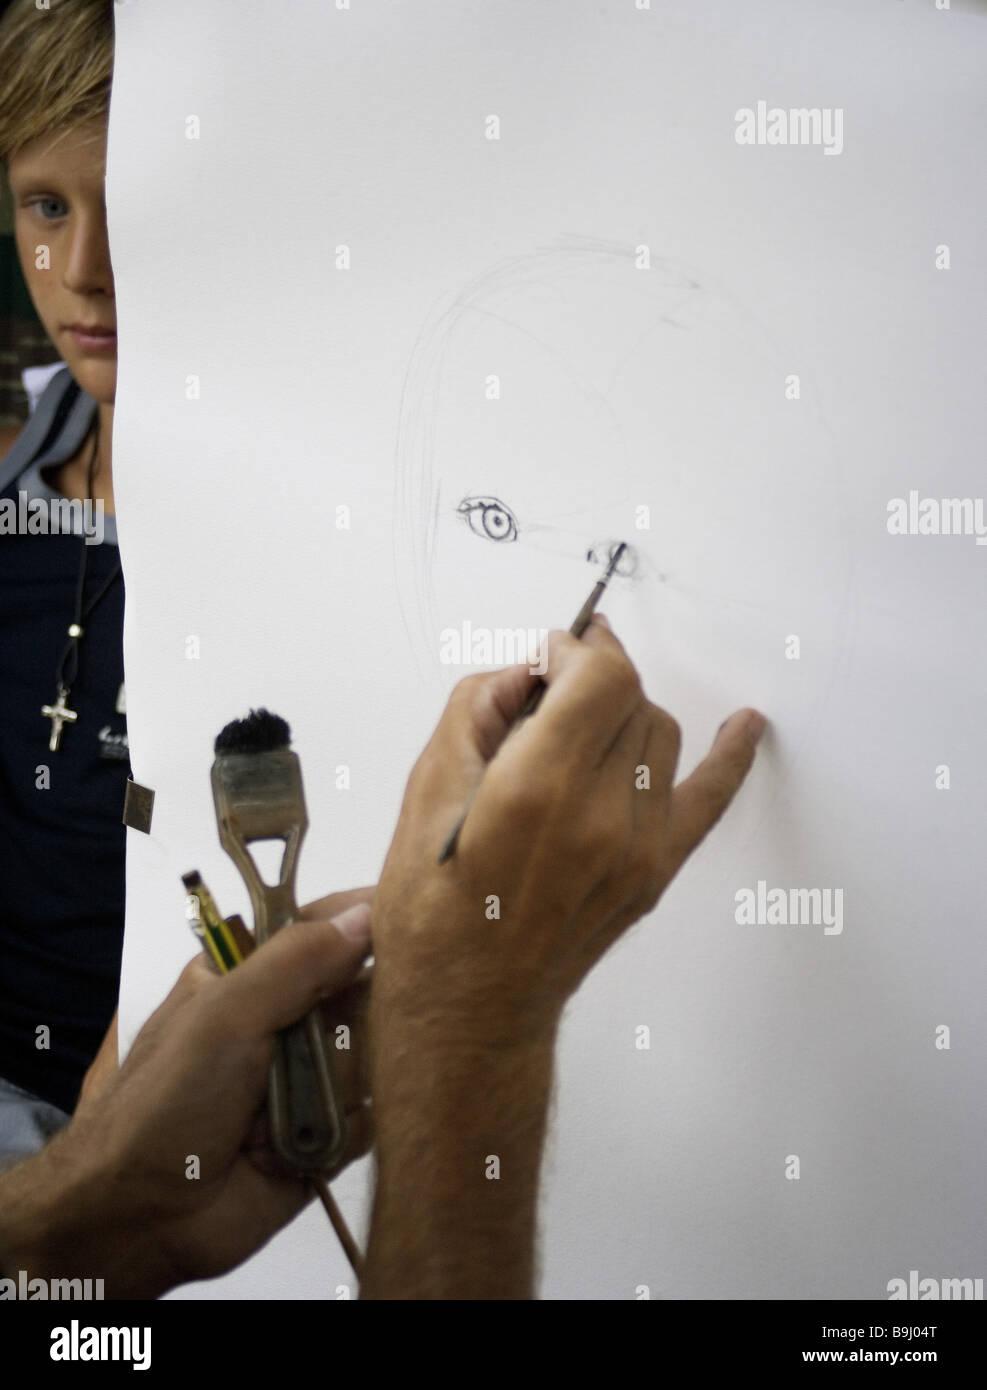 Artists canvas boy portrays broached series art hands men's-hands utensils brushes pencils paper sketch paintings - Stock Image